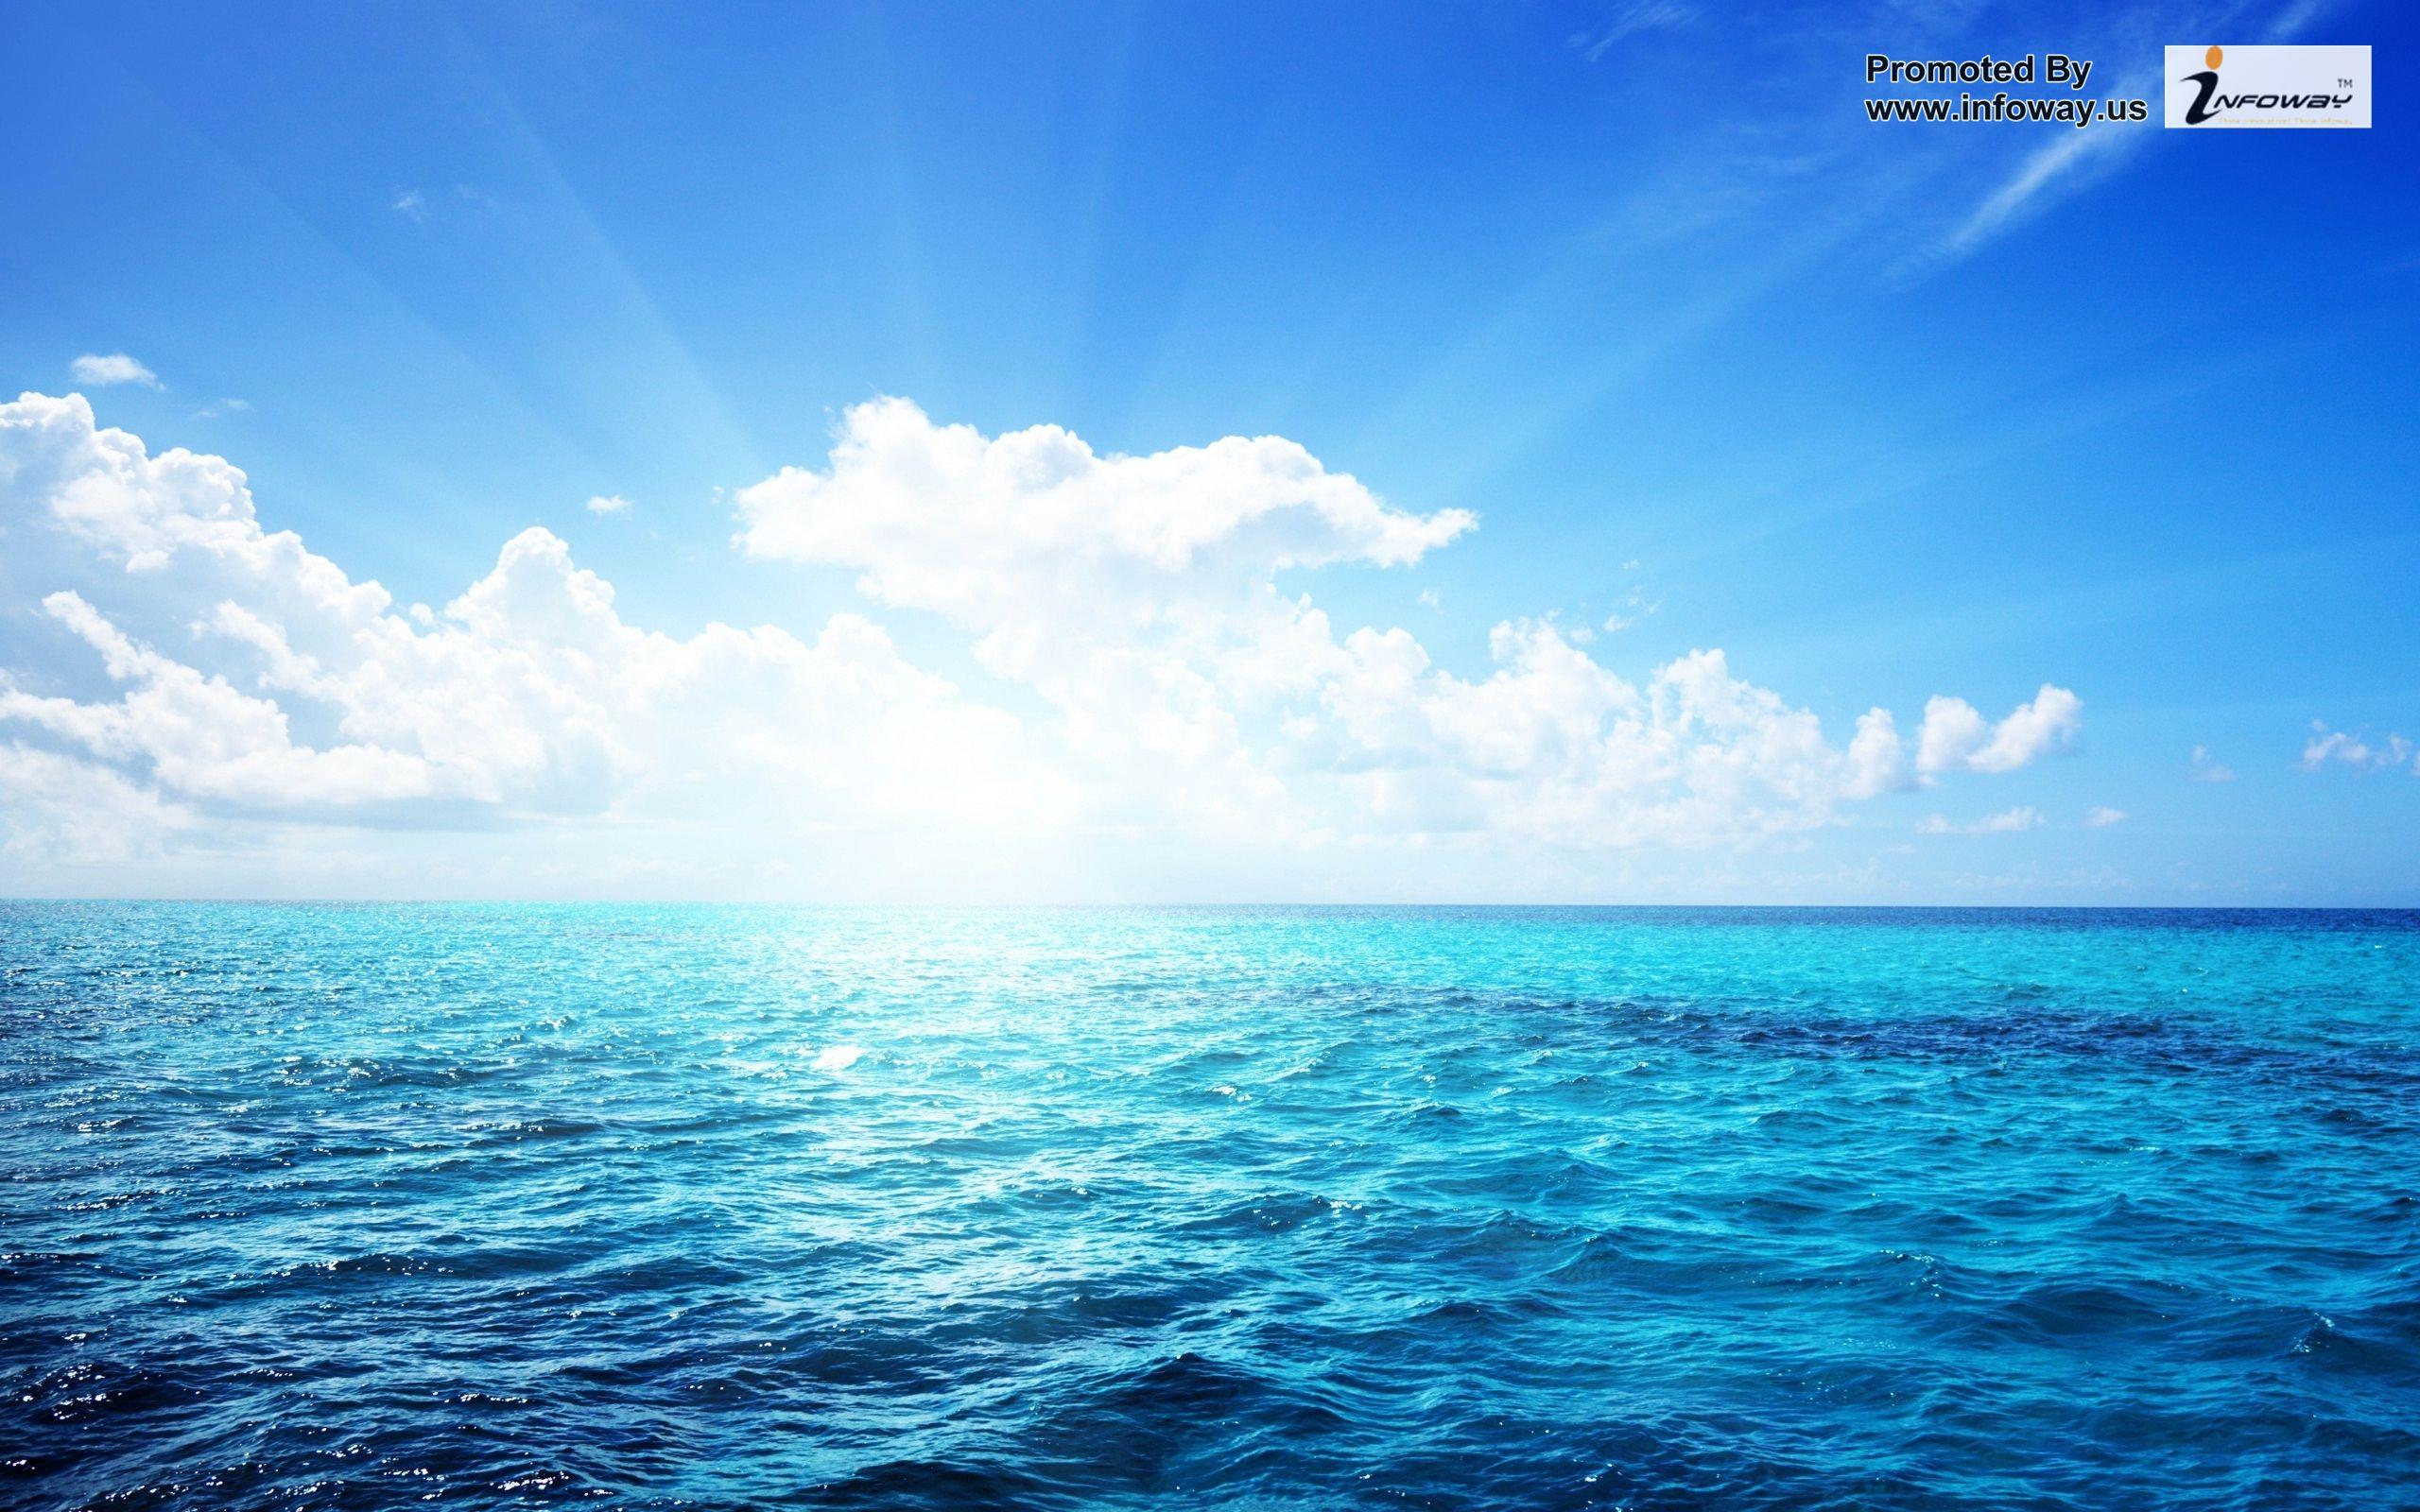 Blue Sea Wallpaper   Photo 174 of 318 phombocom 2560x1600